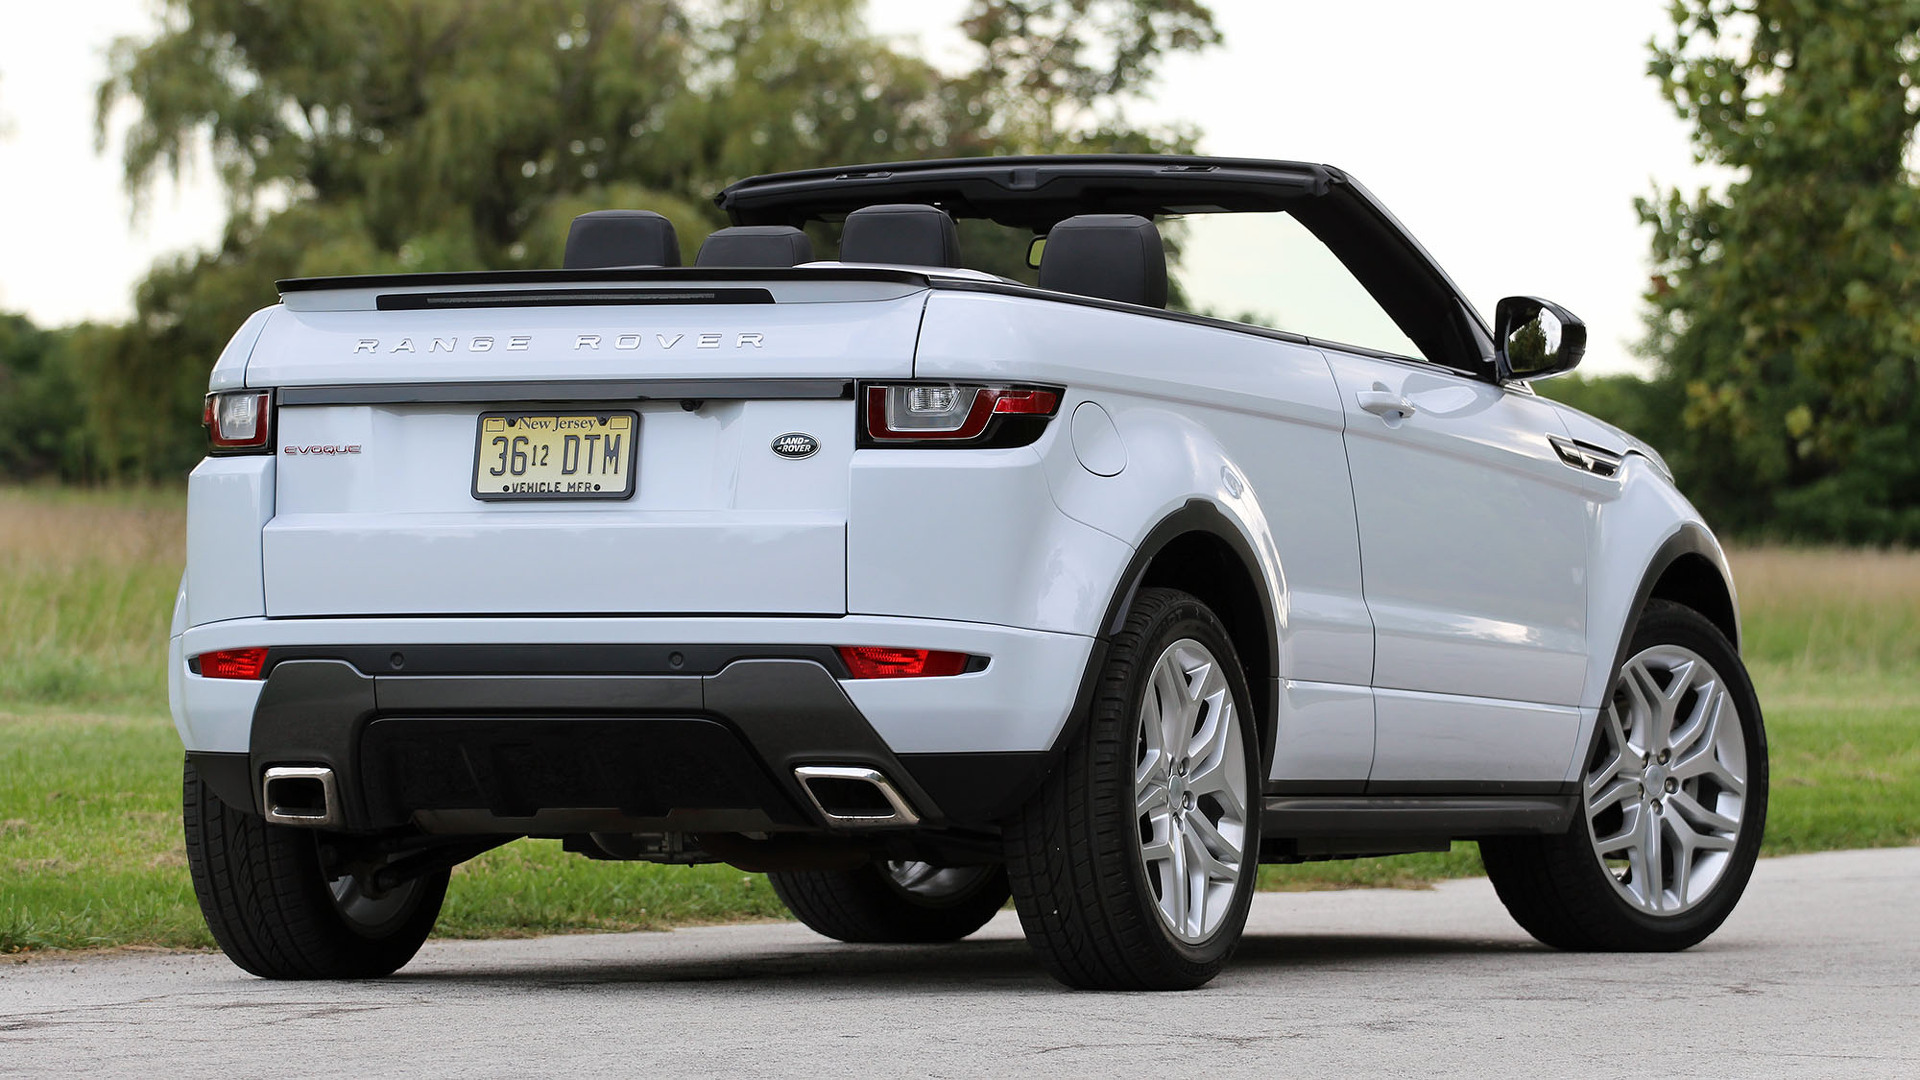 Vw Atlas Towing Capacity >> First Drive: 2017 Land Rover Range Rover Evoque Convertible